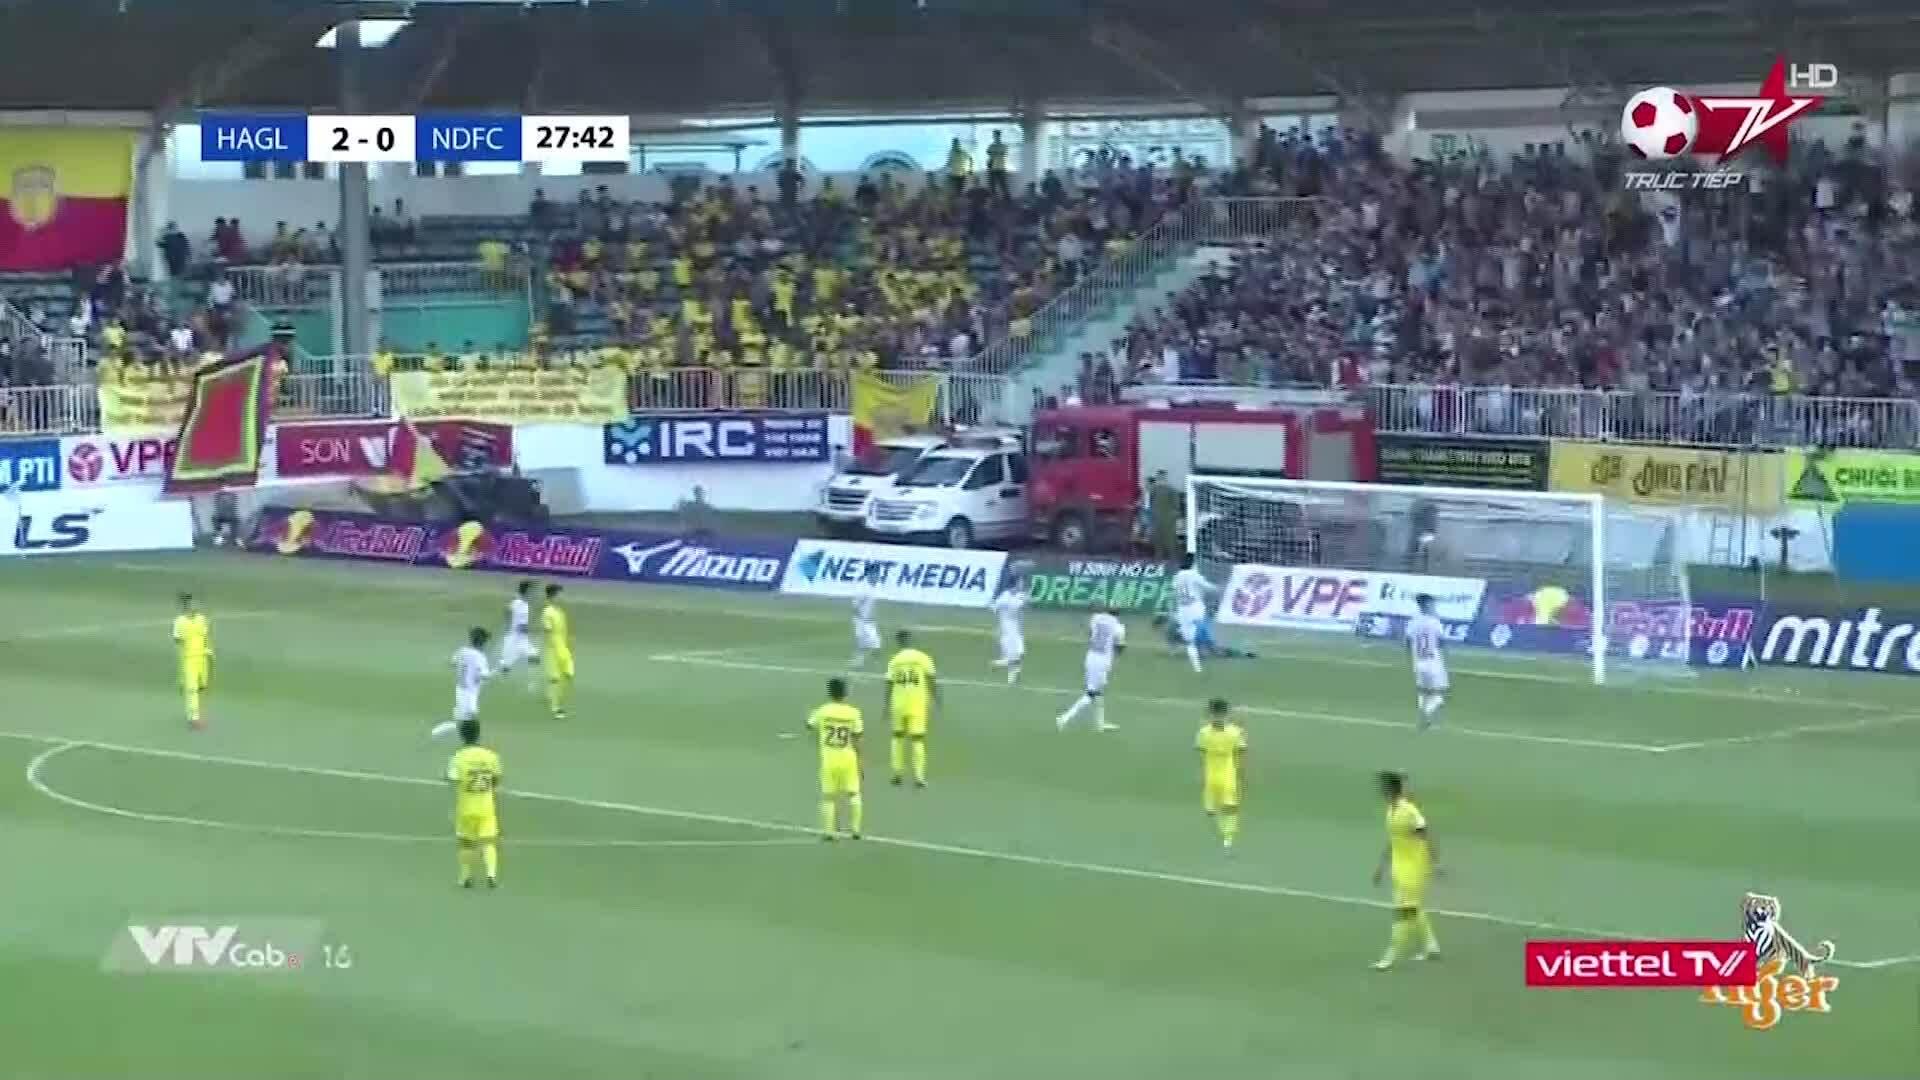 Van Toan mencetak gol penalti